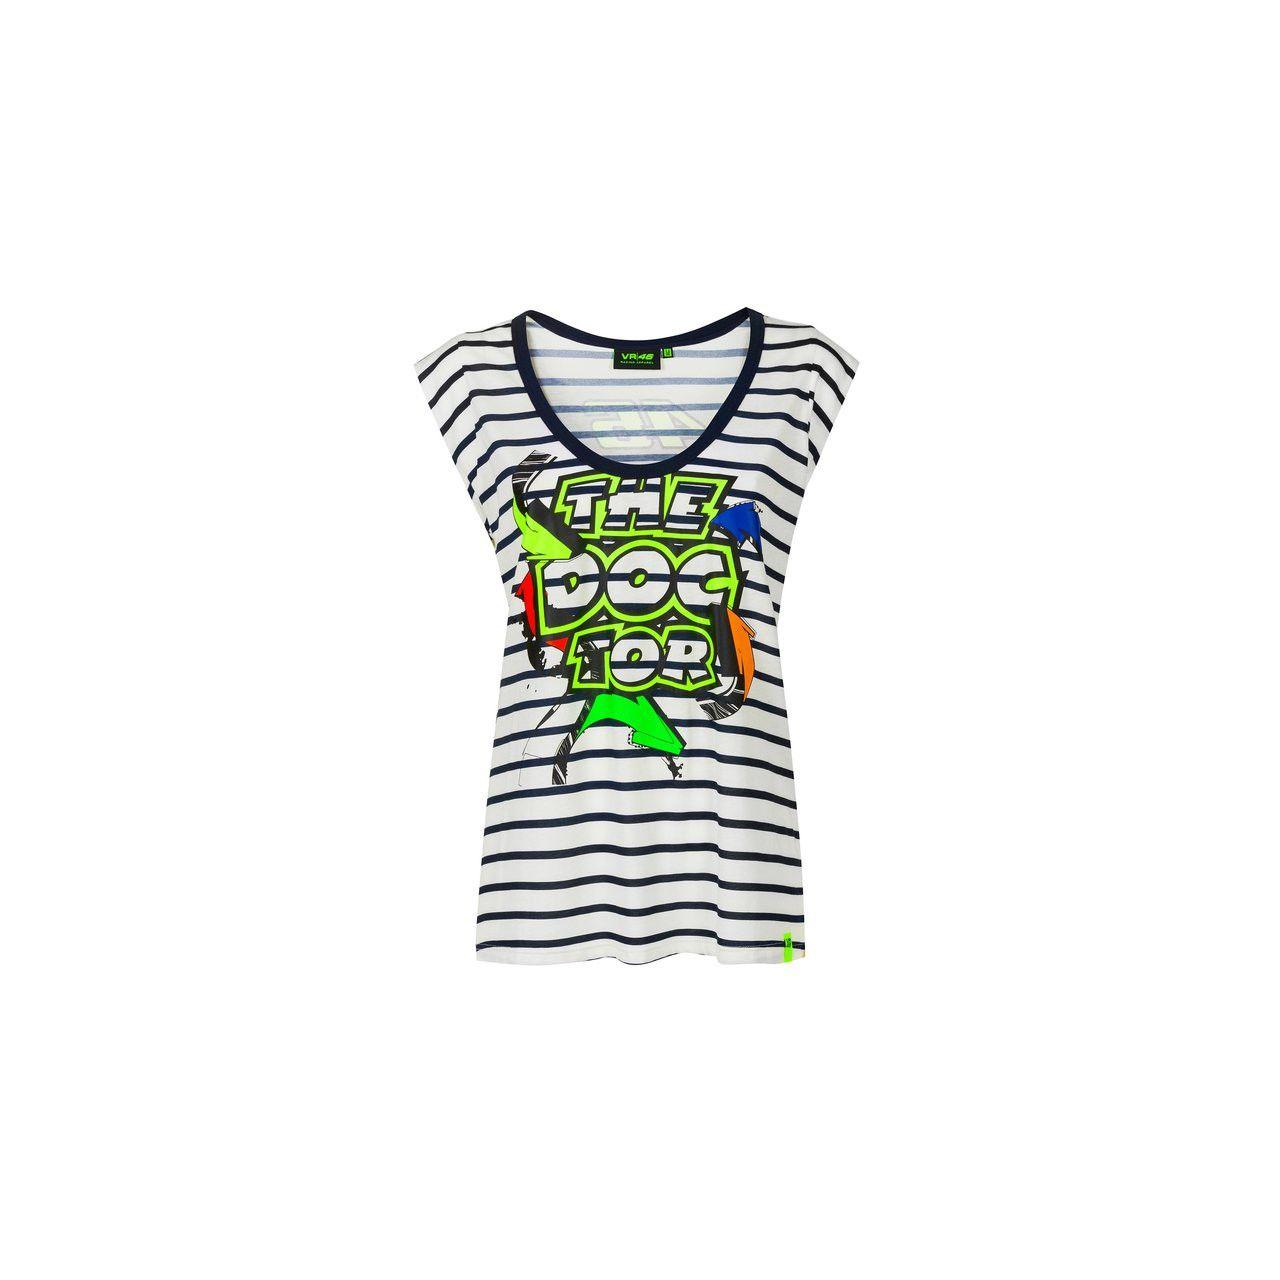 VALENTINO ROSSI T-shirt femme VR46 2020 Street Art